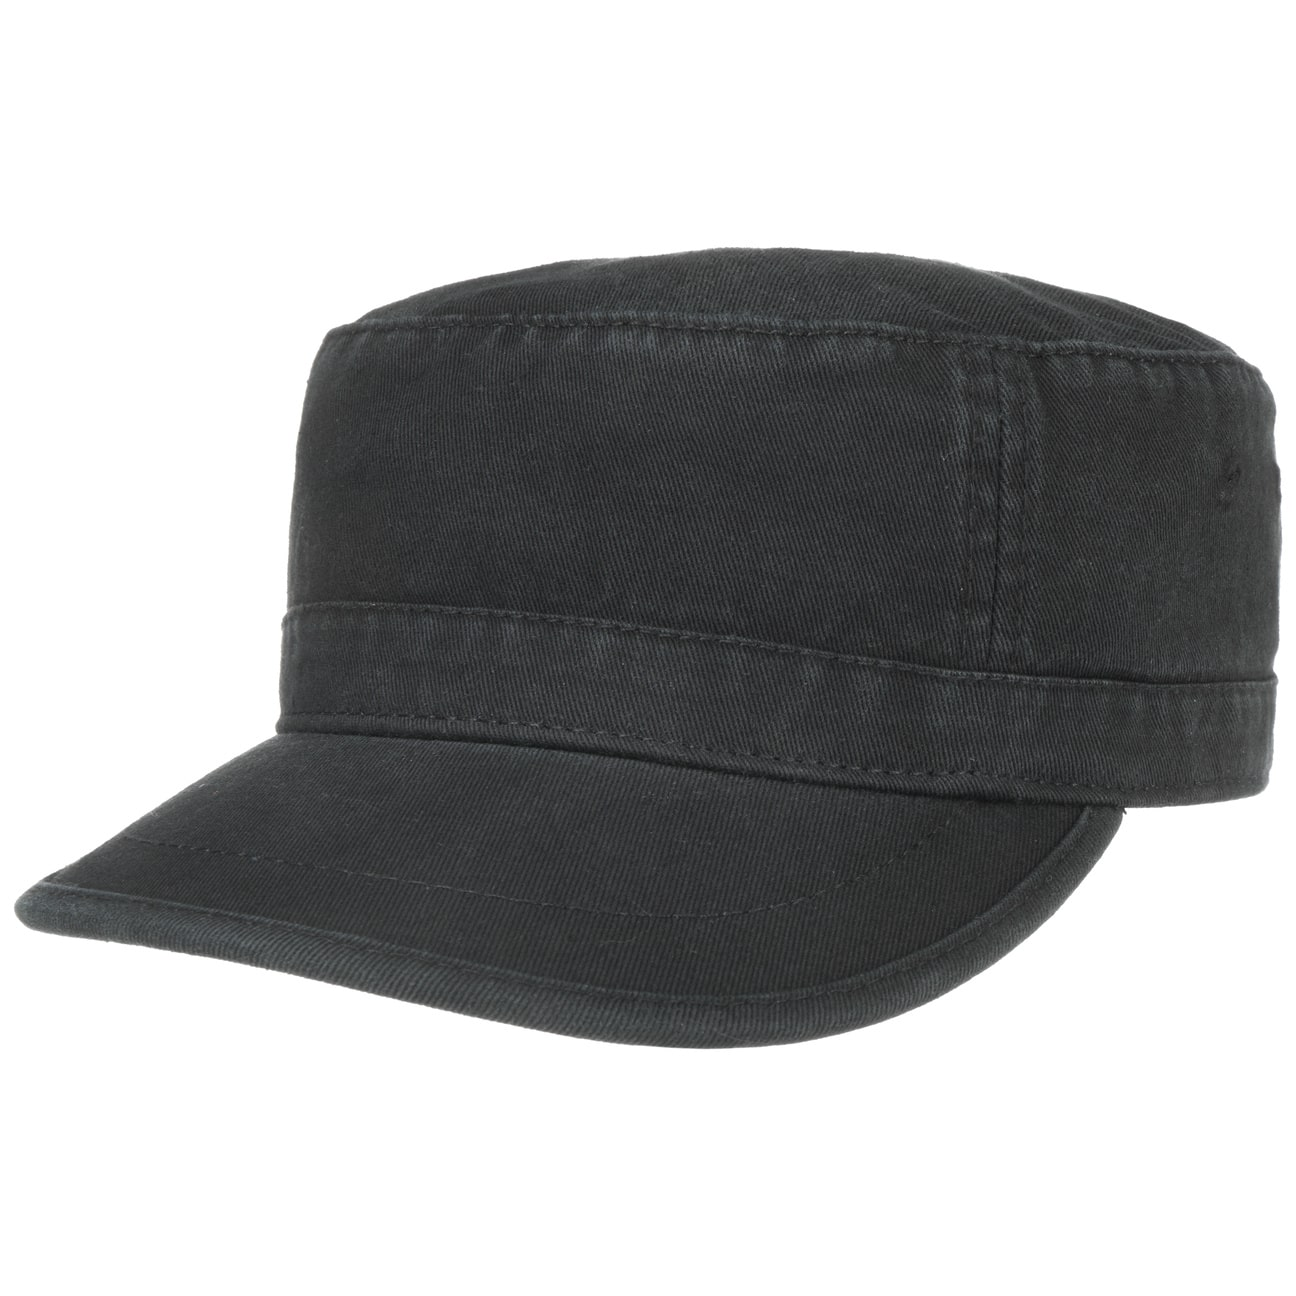 ... Warring Army Cap - black 1 c0c4d2fbdcb